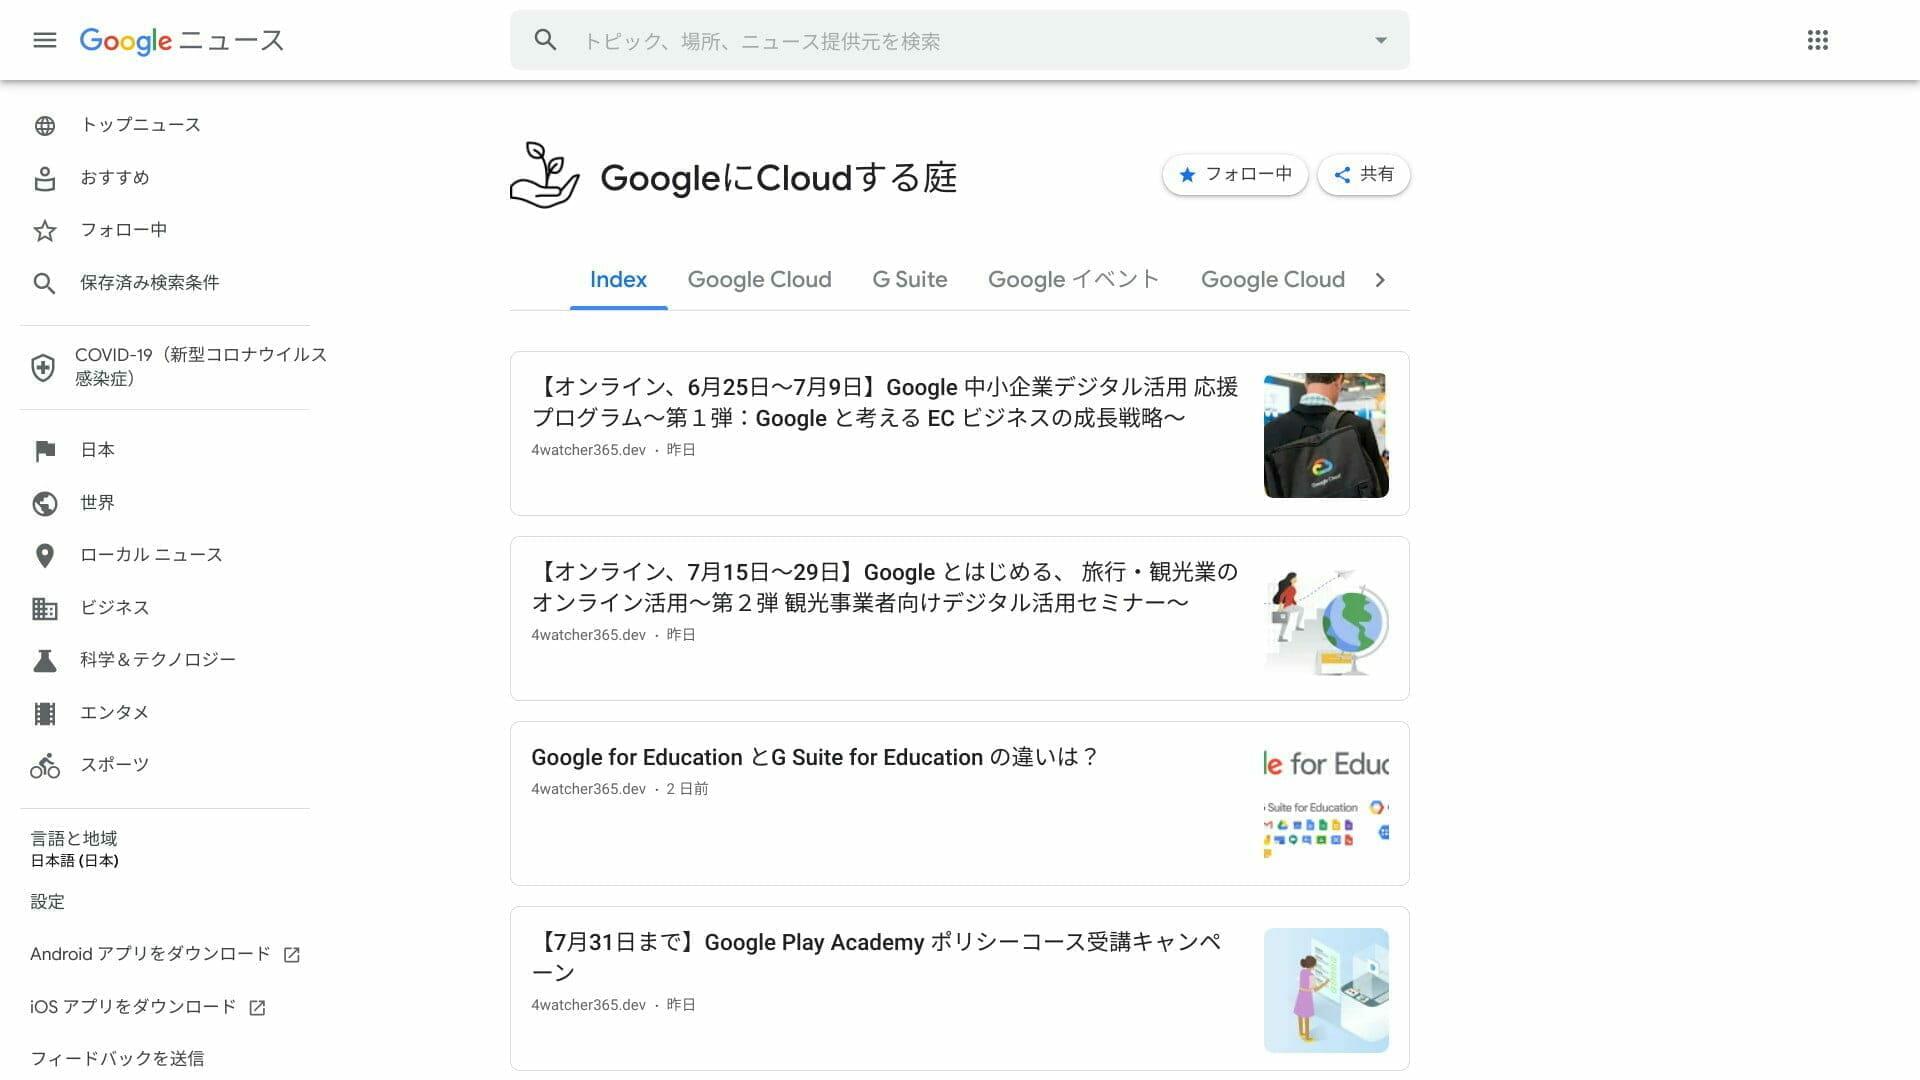 Google ニュース:GoogleにCloudする庭のアカウント